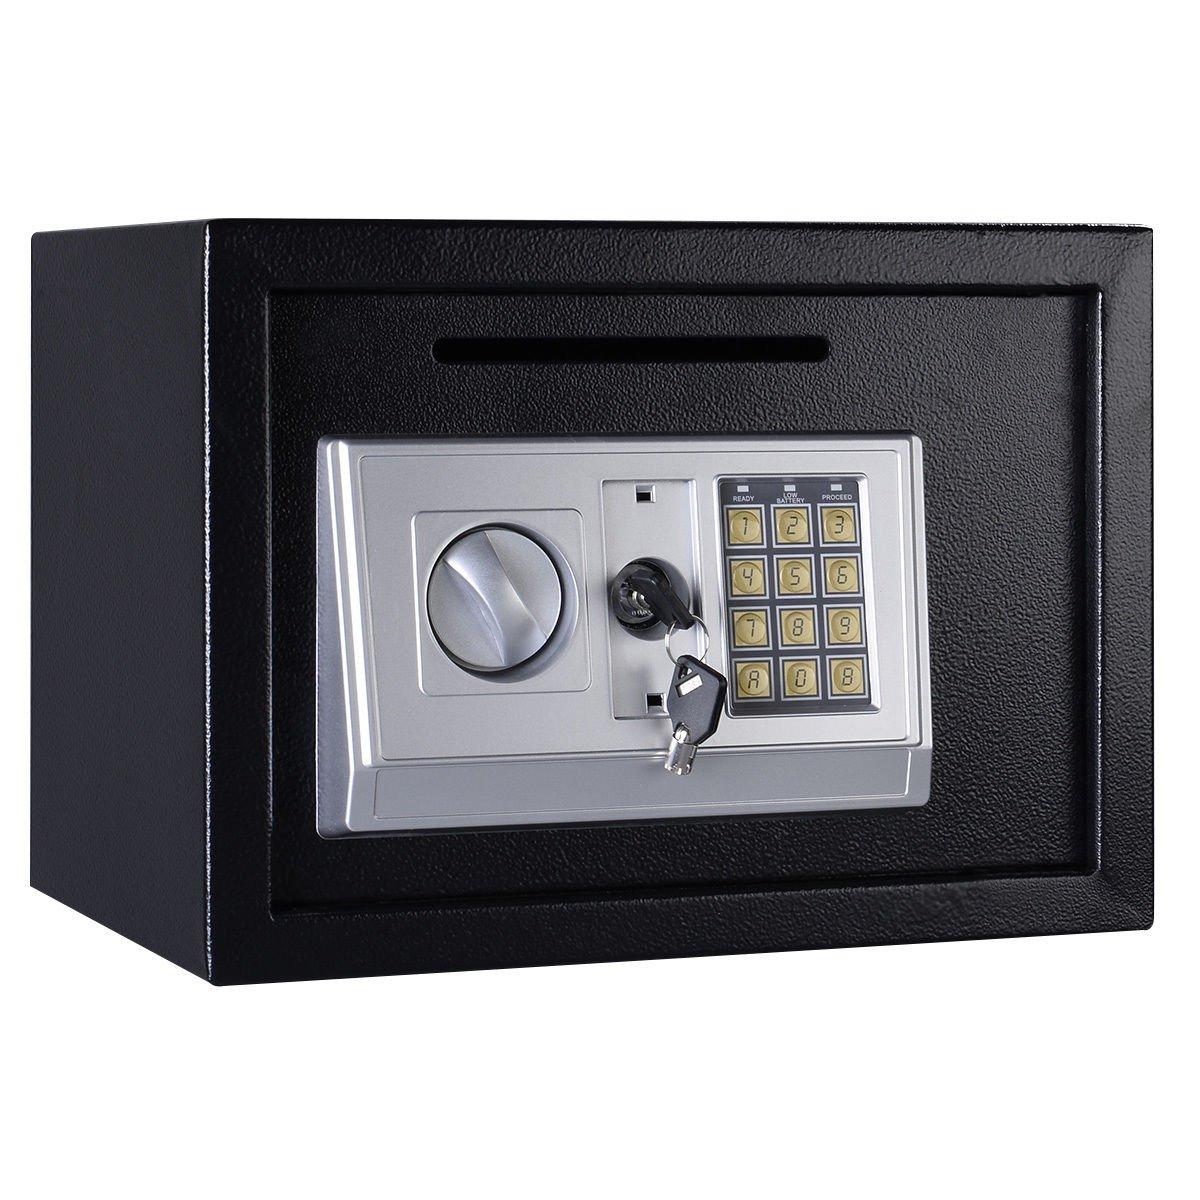 Giantex 14'' Digital Depository Drop Gun Jewelry Home Hotel Lock Cash Safe Box (Black)